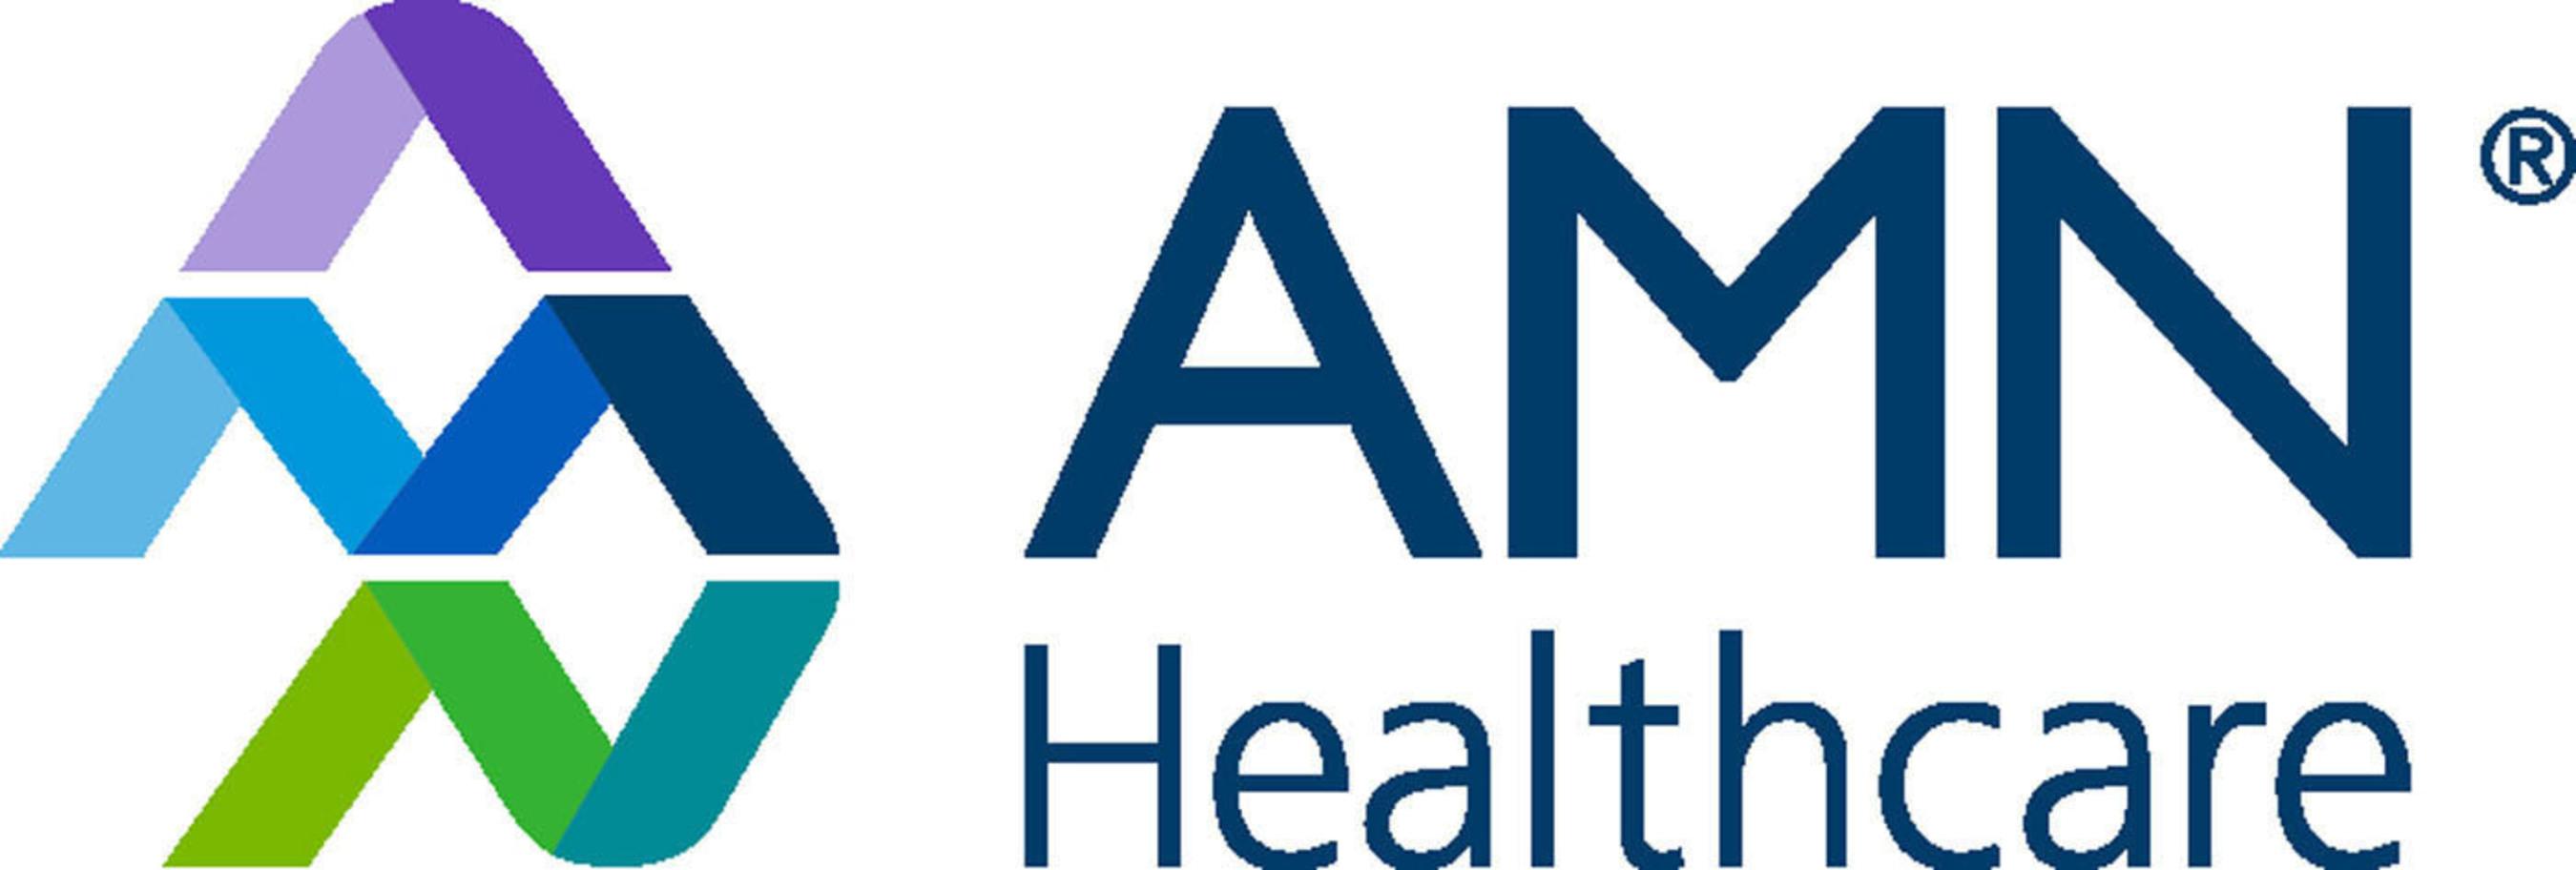 Amn Healthcare Announces Stock Trading Symbol Change To Amn